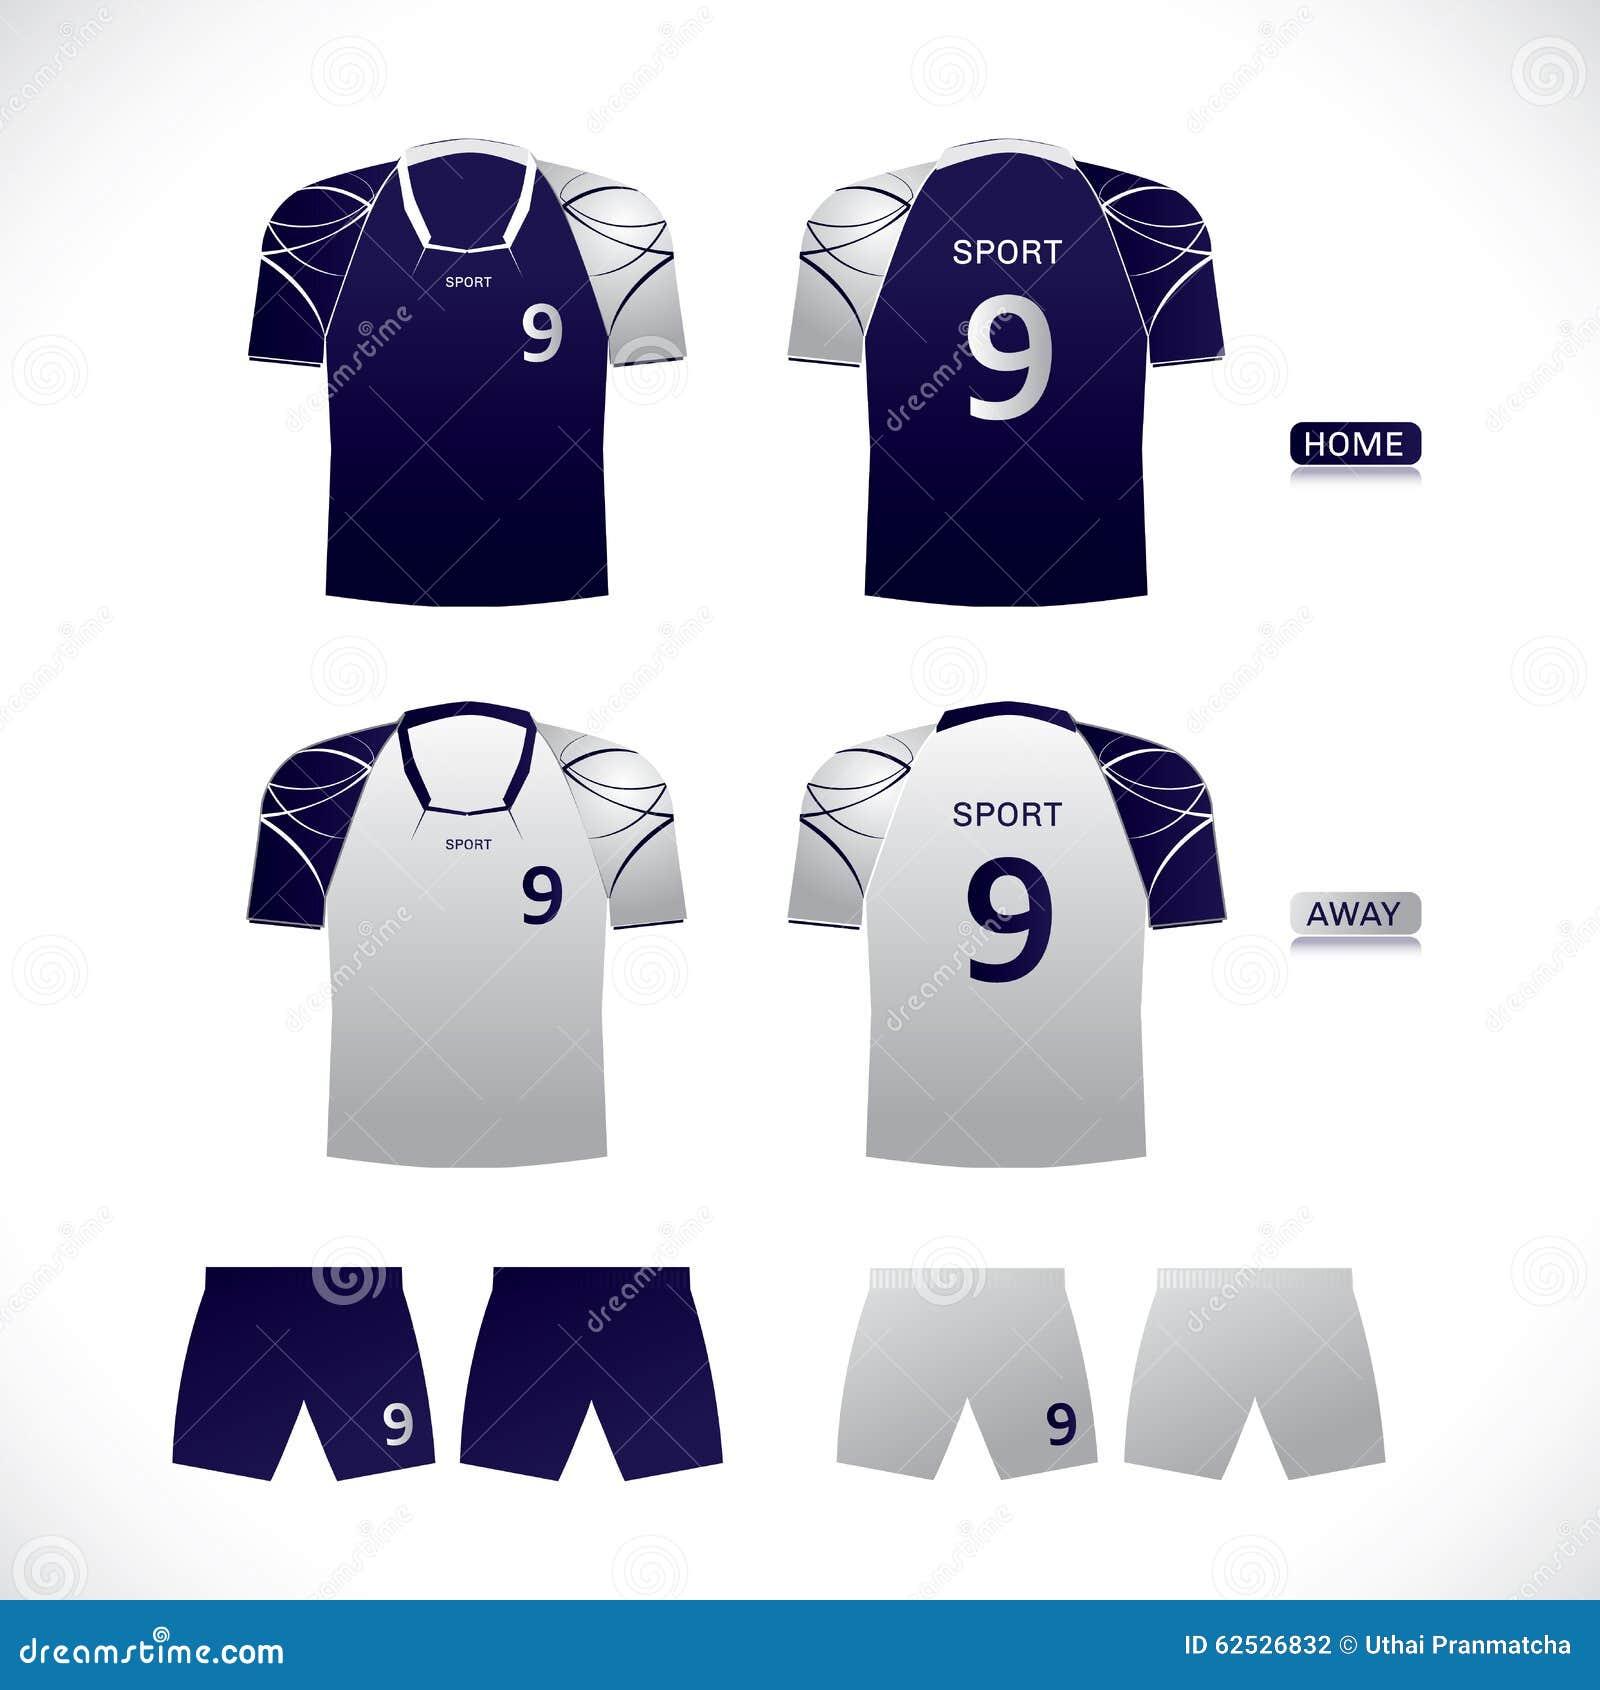 Shirt uniform design vector - Vector Sport Player Uniform Design